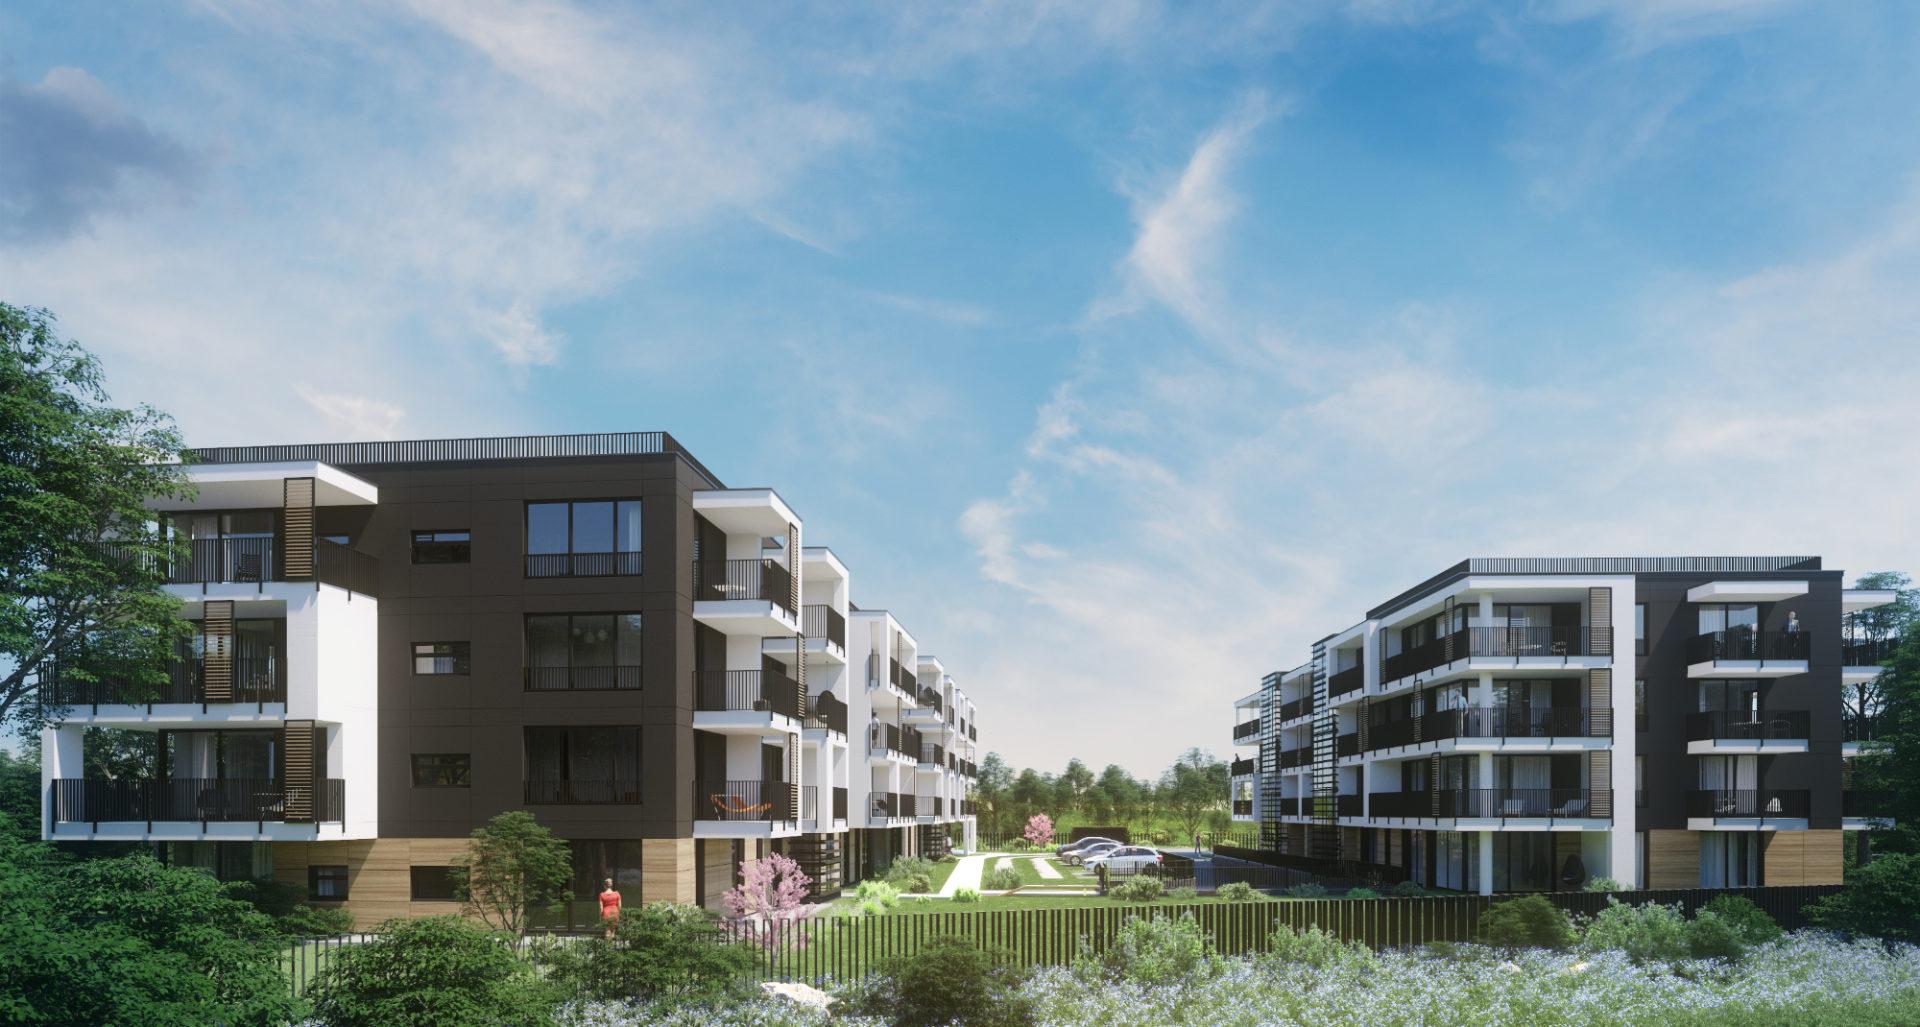 3D visualisation showing a housing development - exterior day